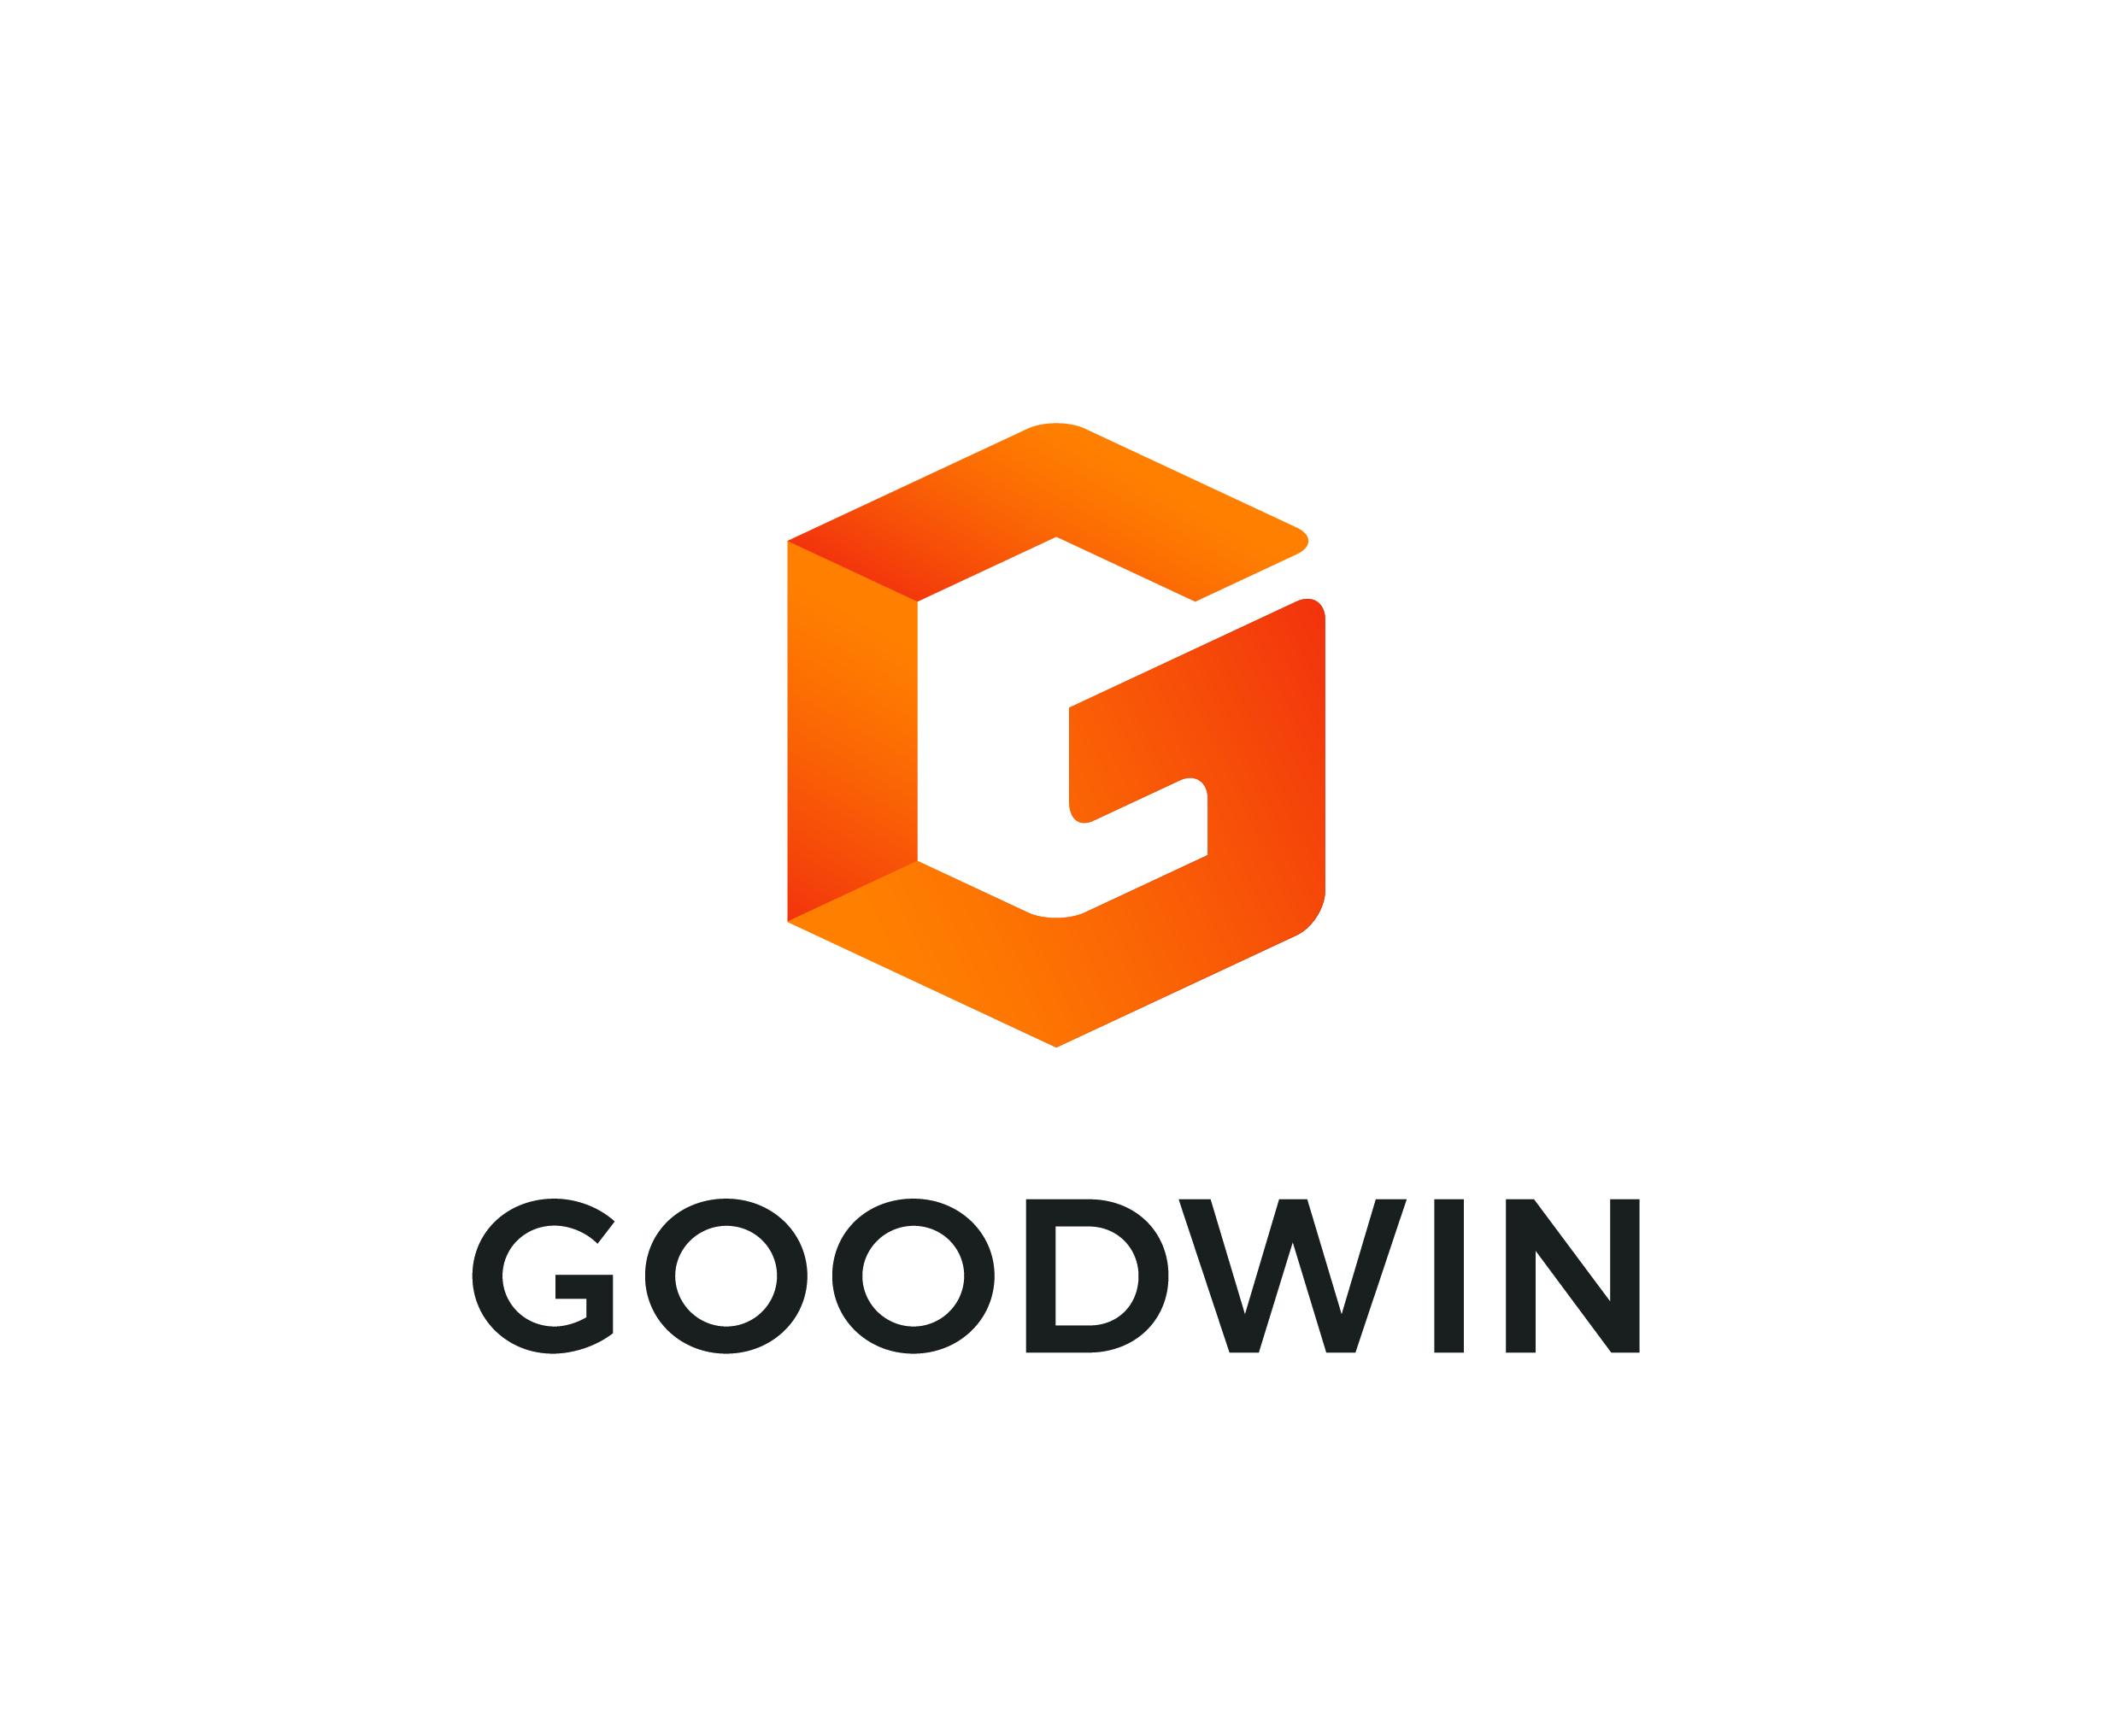 Goodwin - Auto IP USA 2019